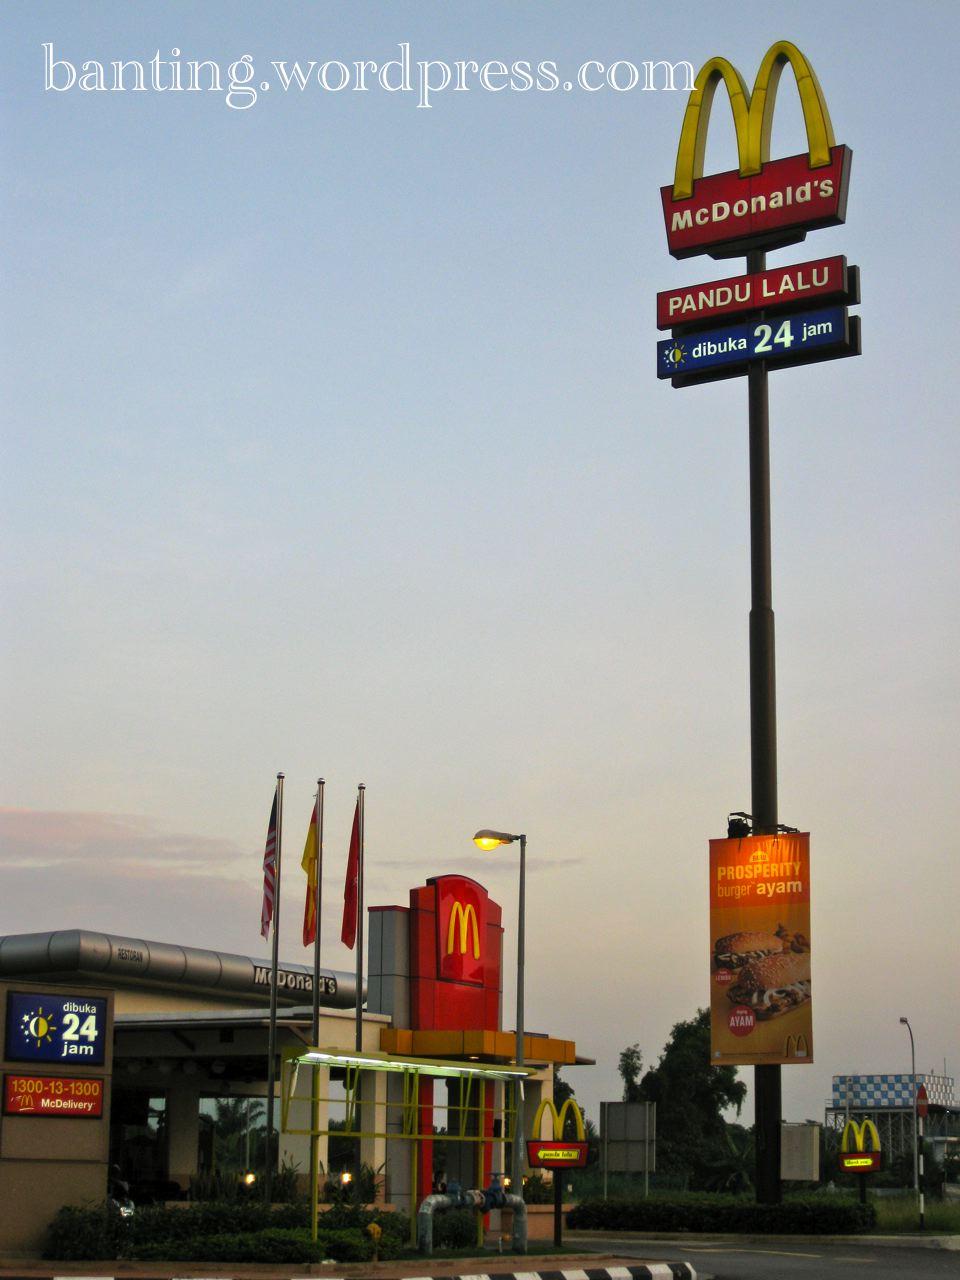 McDonald's Banting